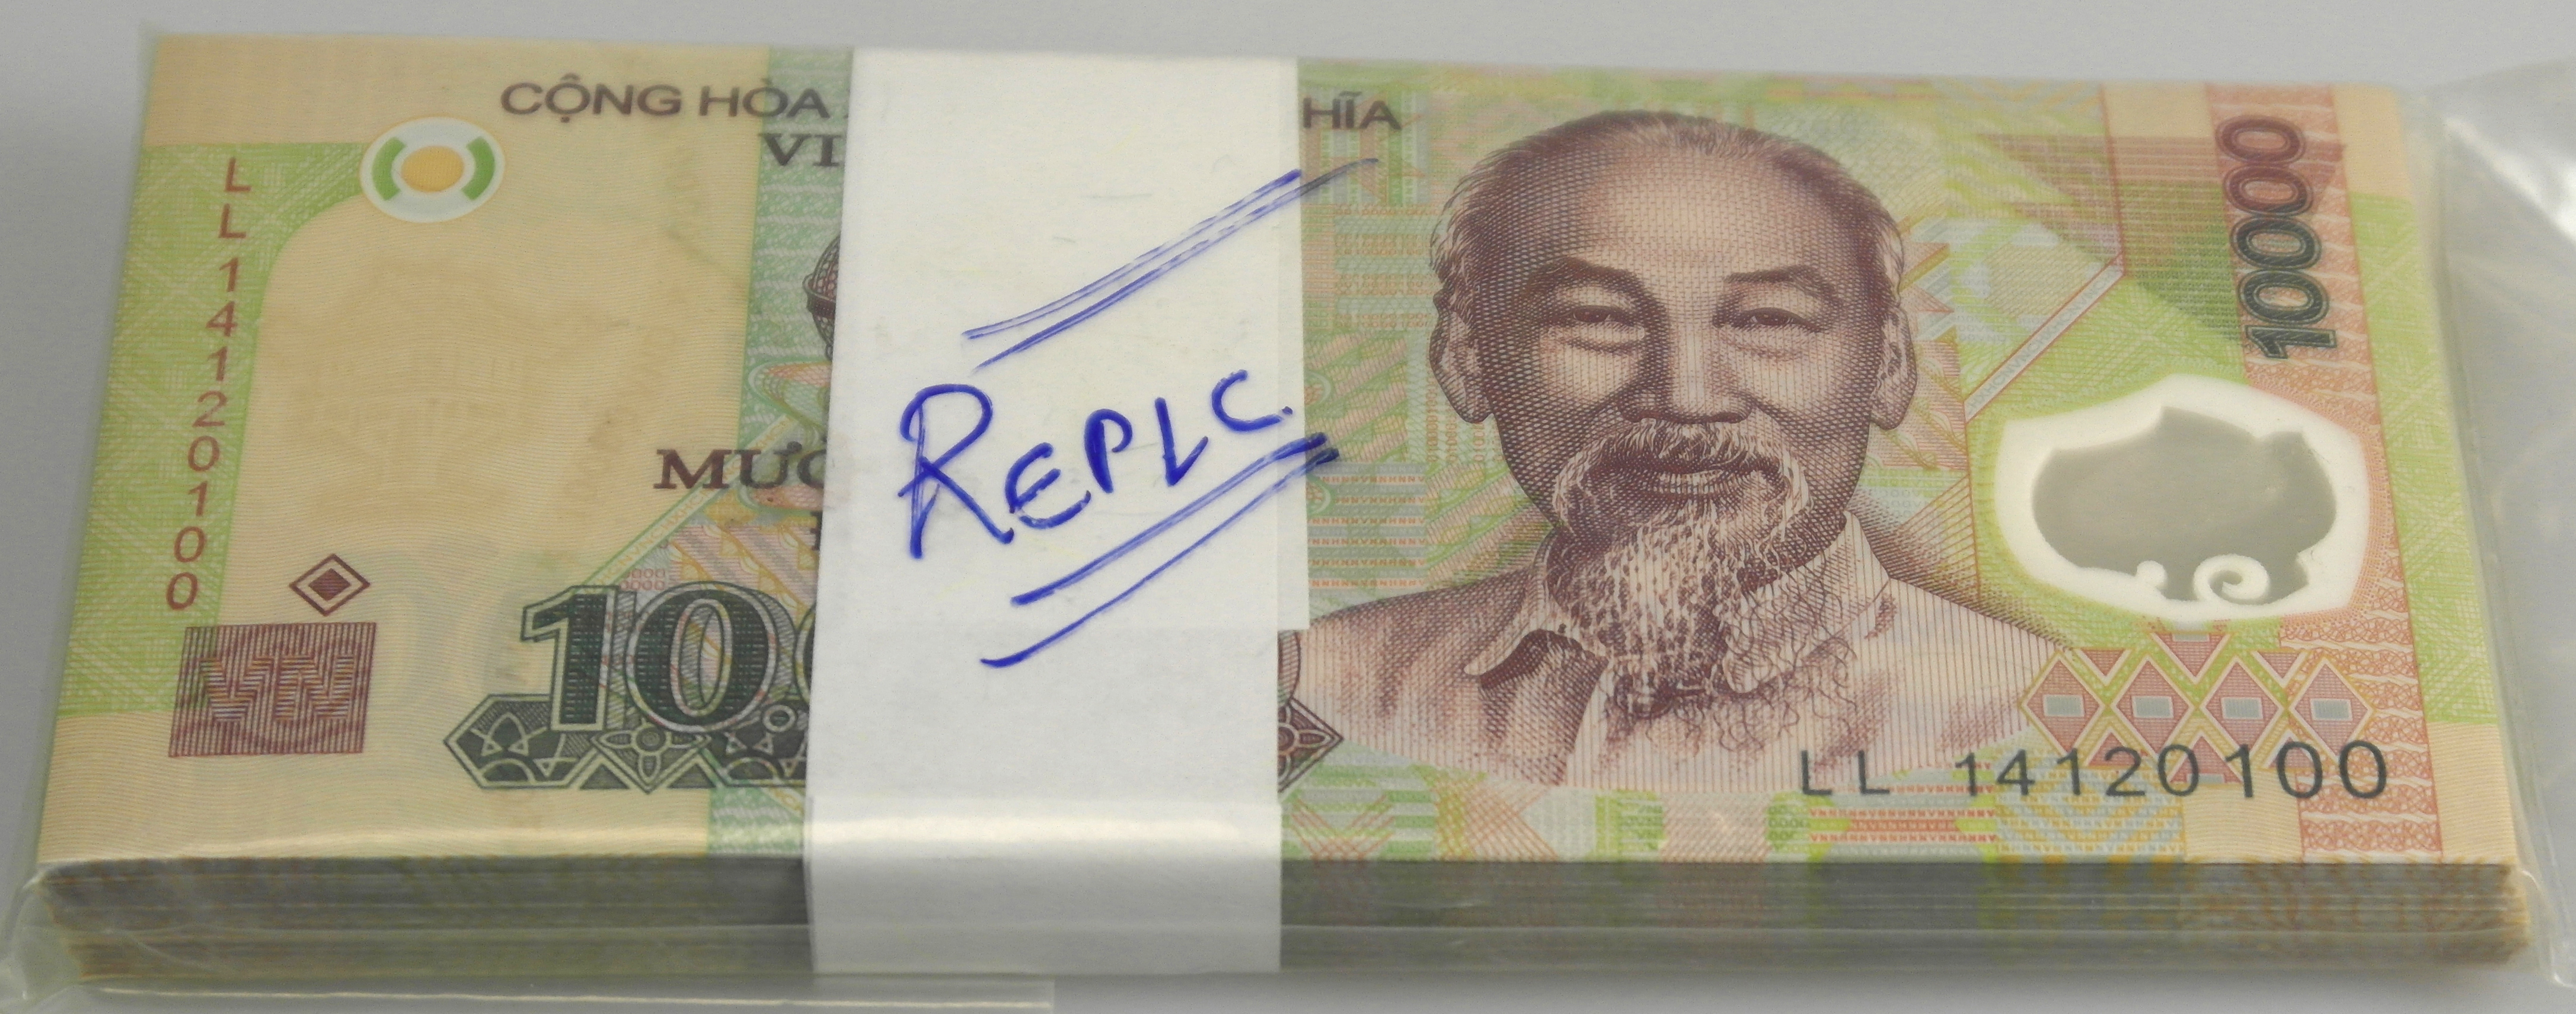 Lot 2683 - Vietnam   Banknoten  -  Auktionshaus Christoph Gärtner GmbH & Co. KG Banknotes & Coins Auction #39 Day 2